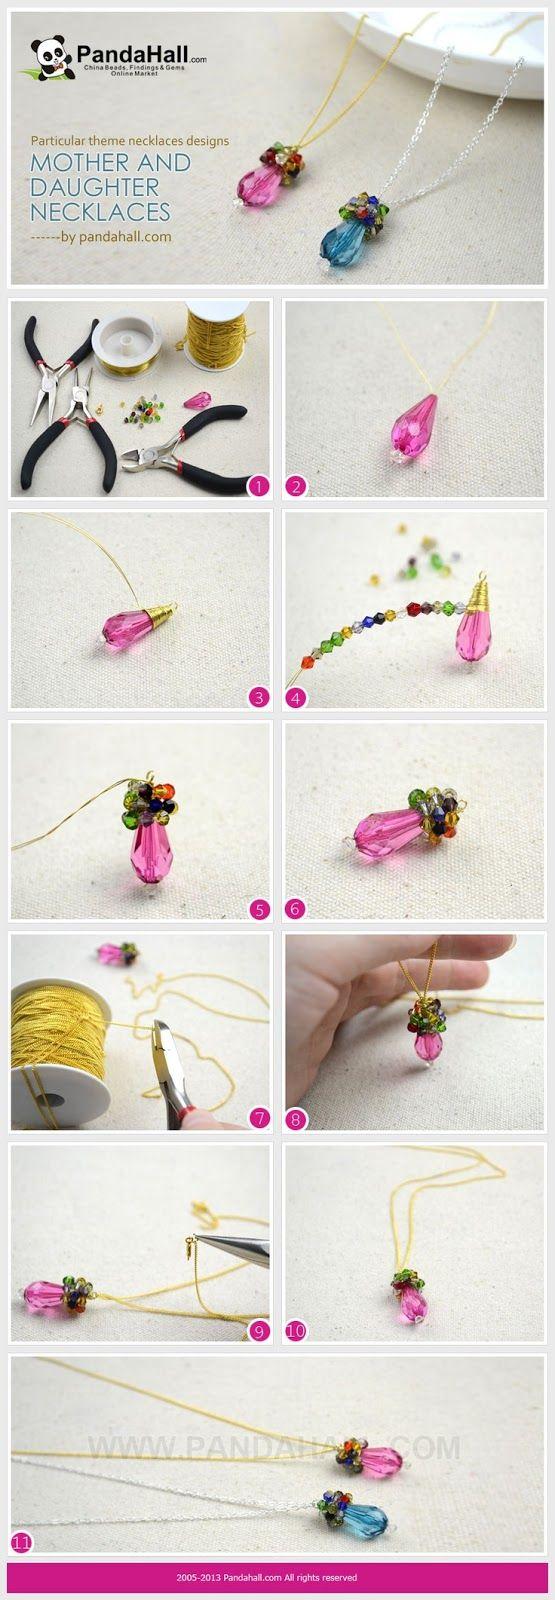 enrHedando: How to make a Teardrop Pendant with Crystal